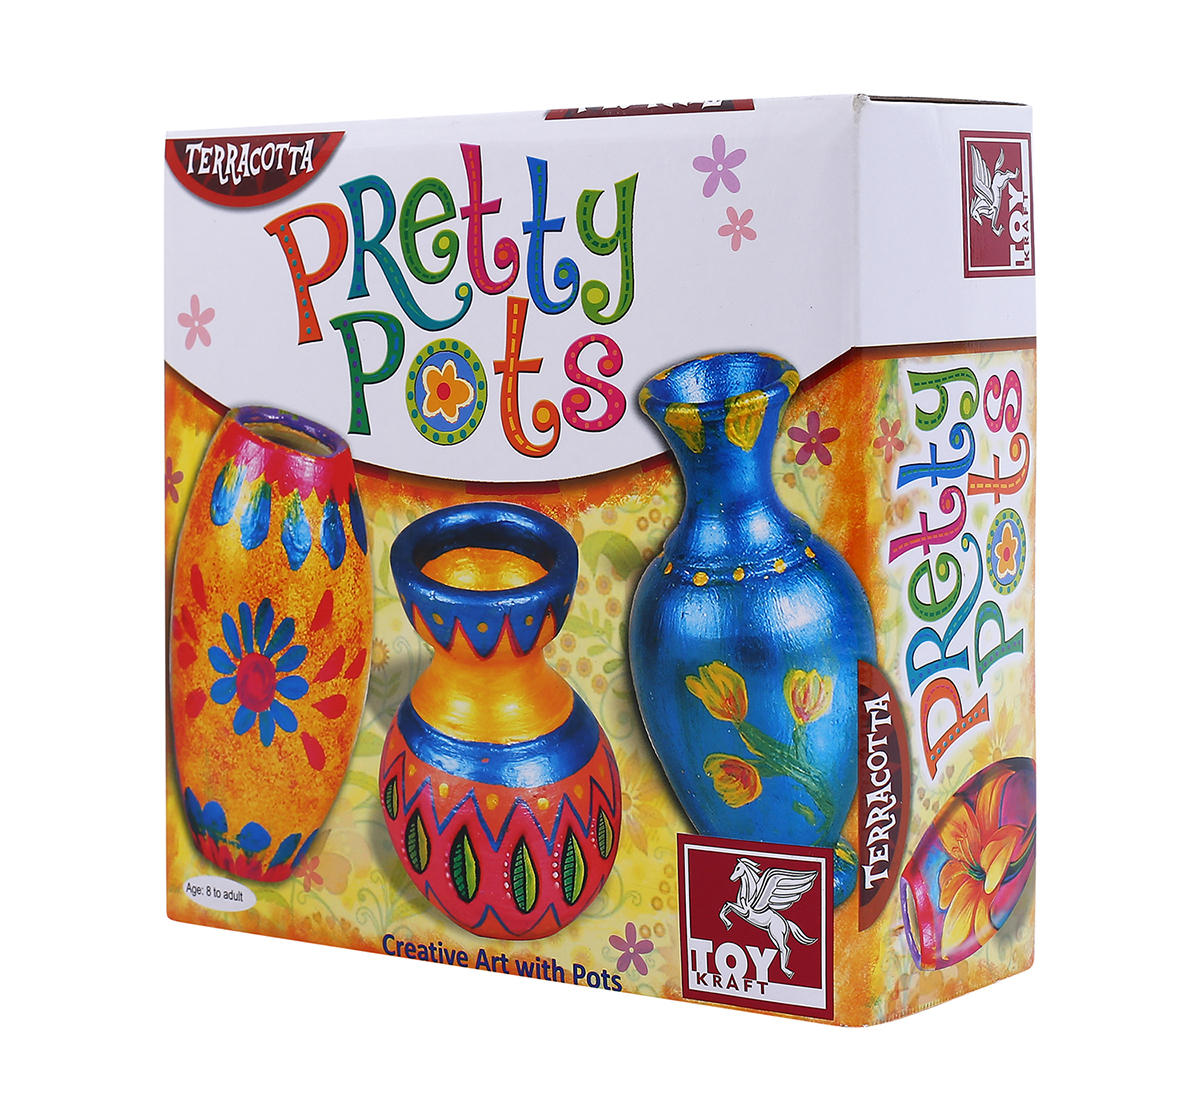 Toy Kraft | Toy Kraft Pretty Pots DIY Art & Craft Kits for Kids age 8Y+